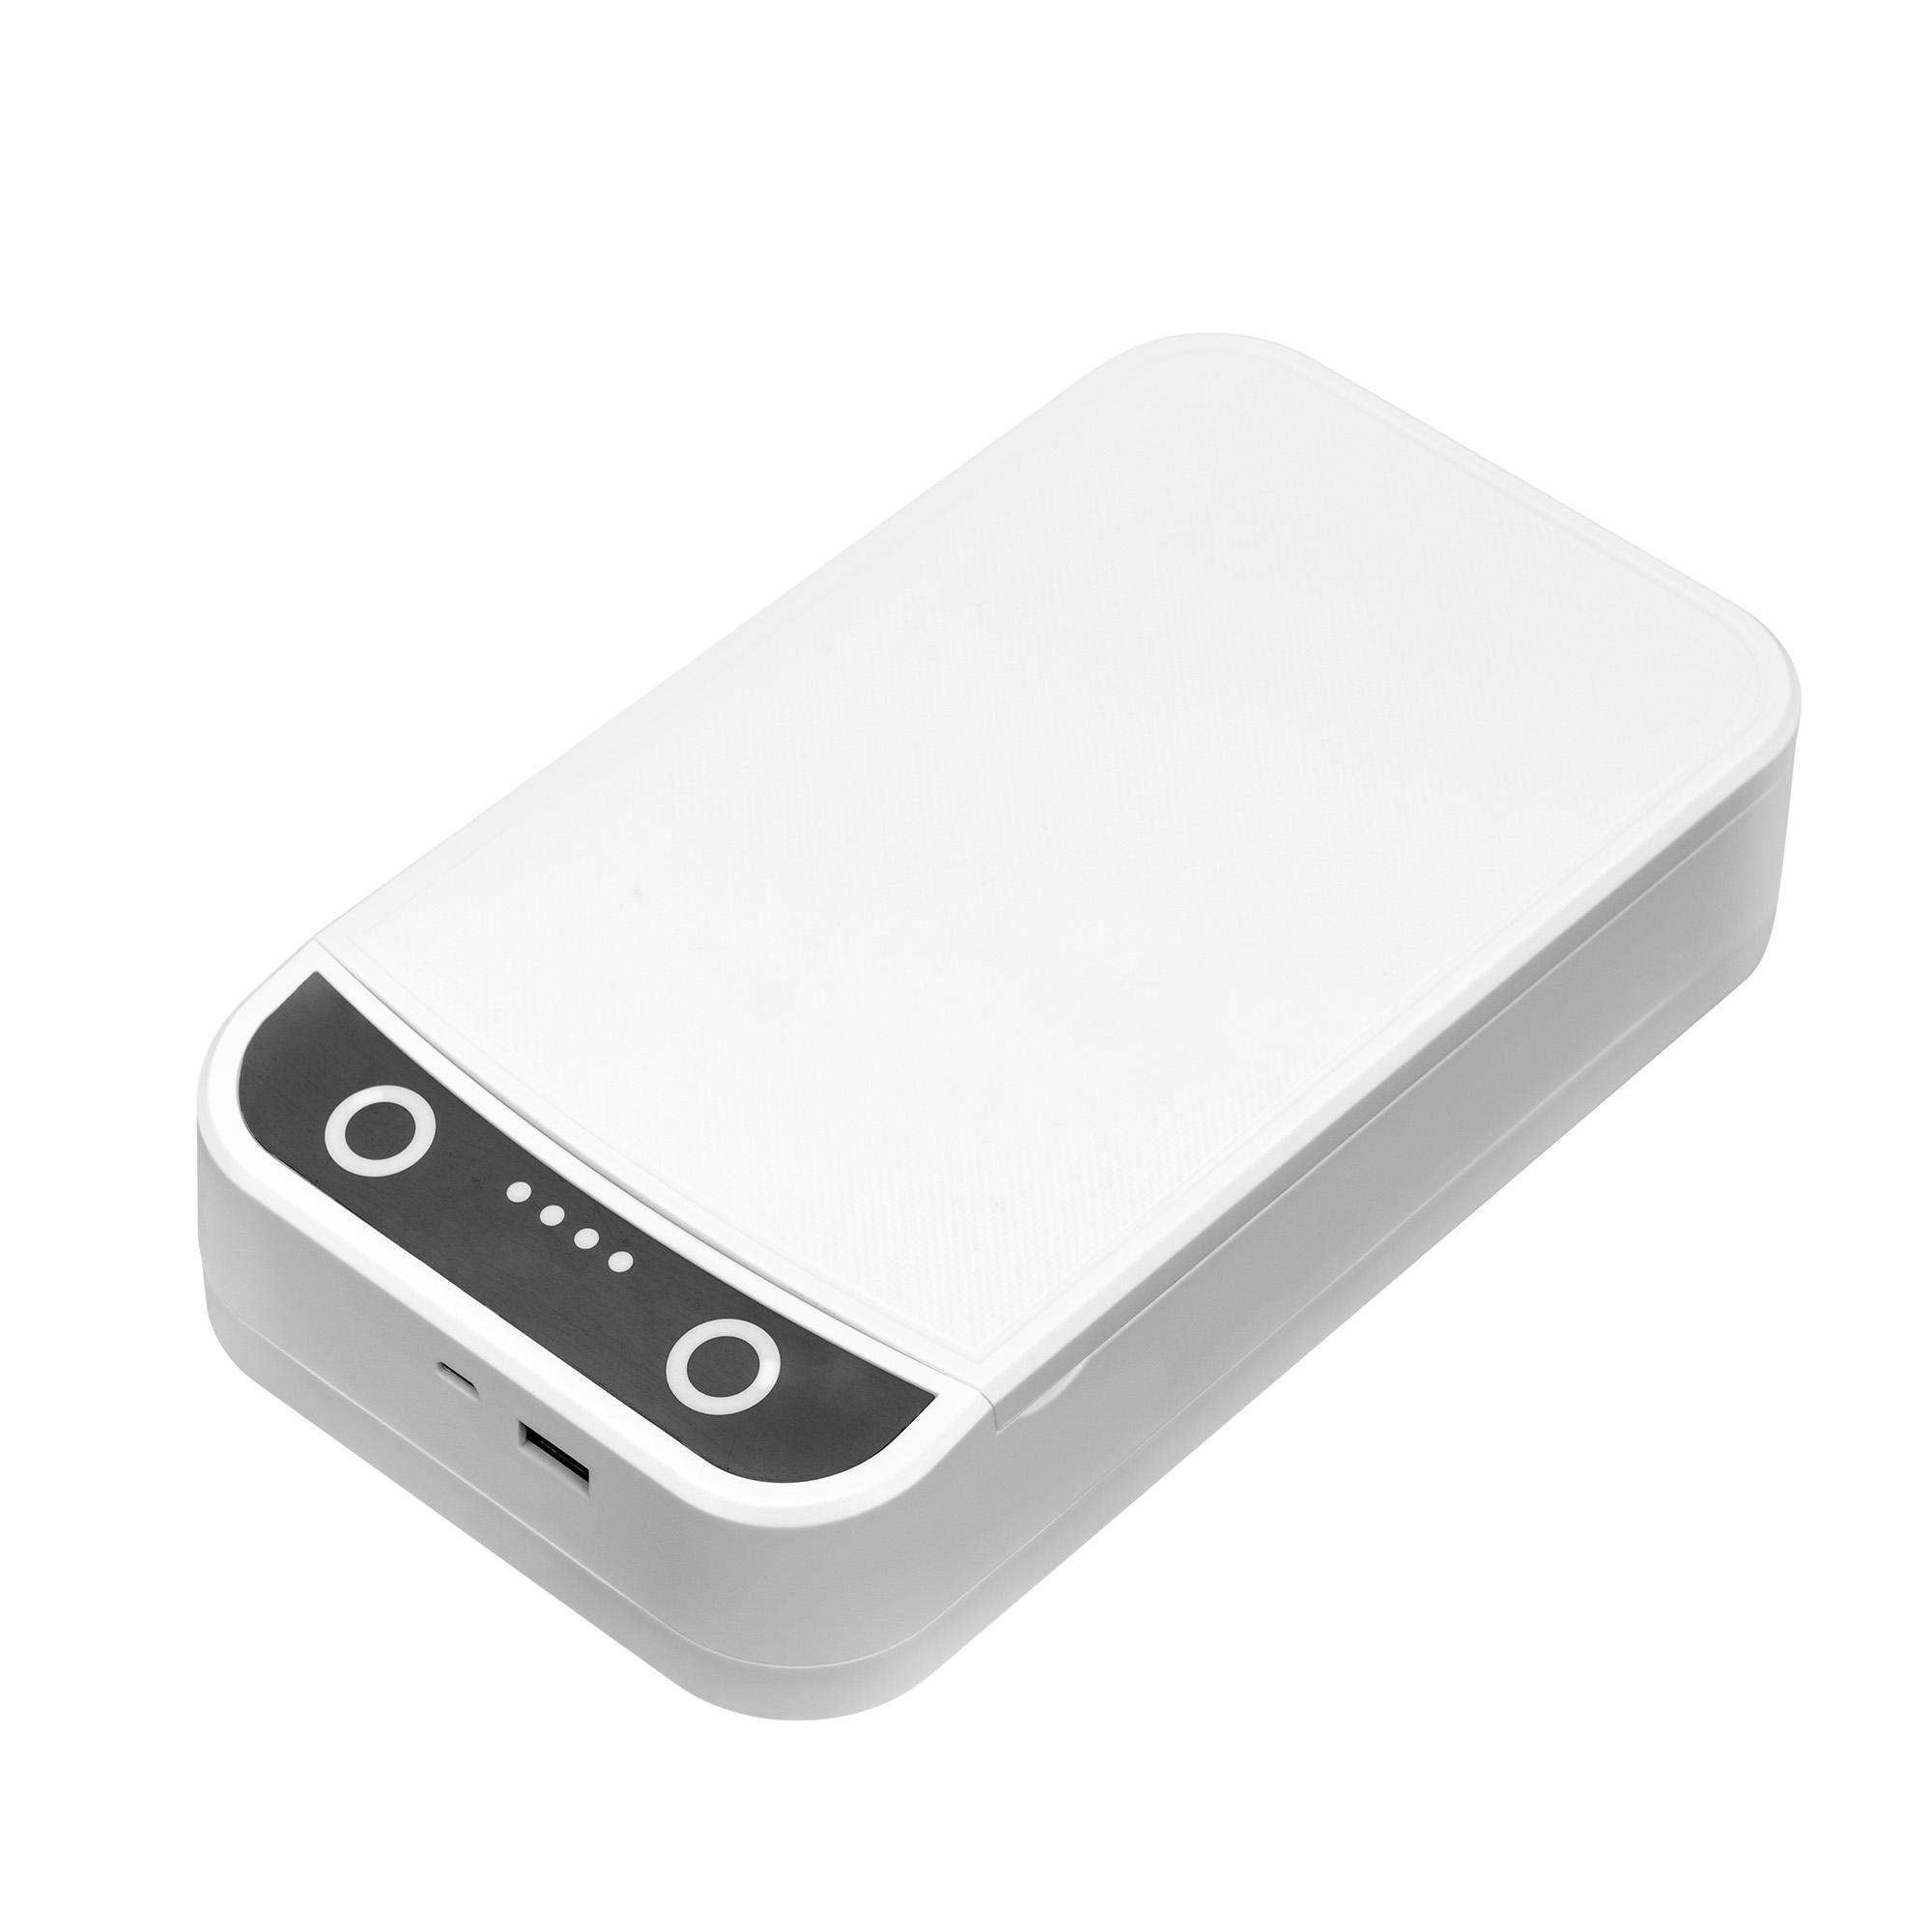 Hot Sales Portable Smartphone Sanitizer UV Light, UV Led Cell Phone Foldable Sanitizer UV Lamp Sterilizer Box